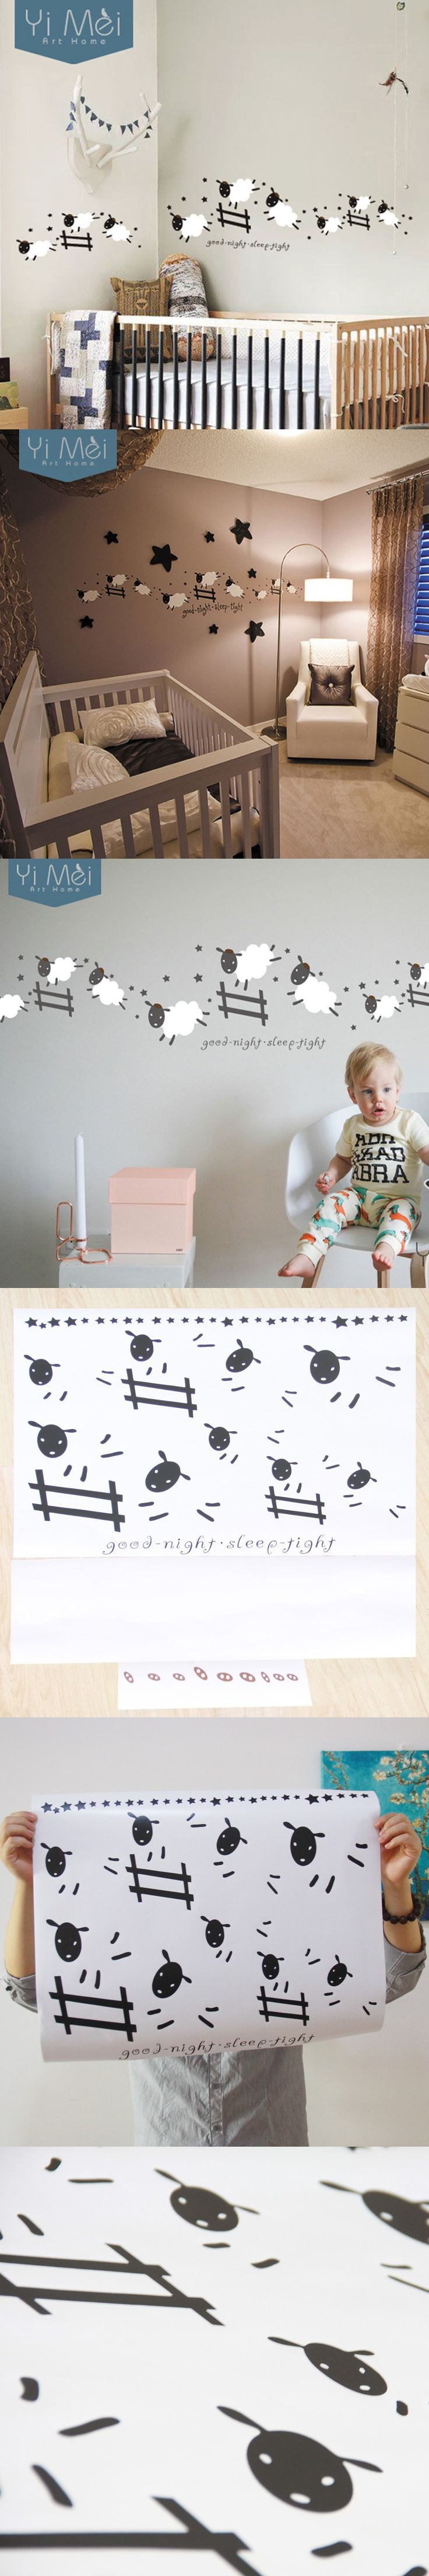 Jumping Sheep Wall Sticker -Good Night, Sleep Tight Decal Sticker Counting sheep Decal Sticker 40*120CM Home Decoration